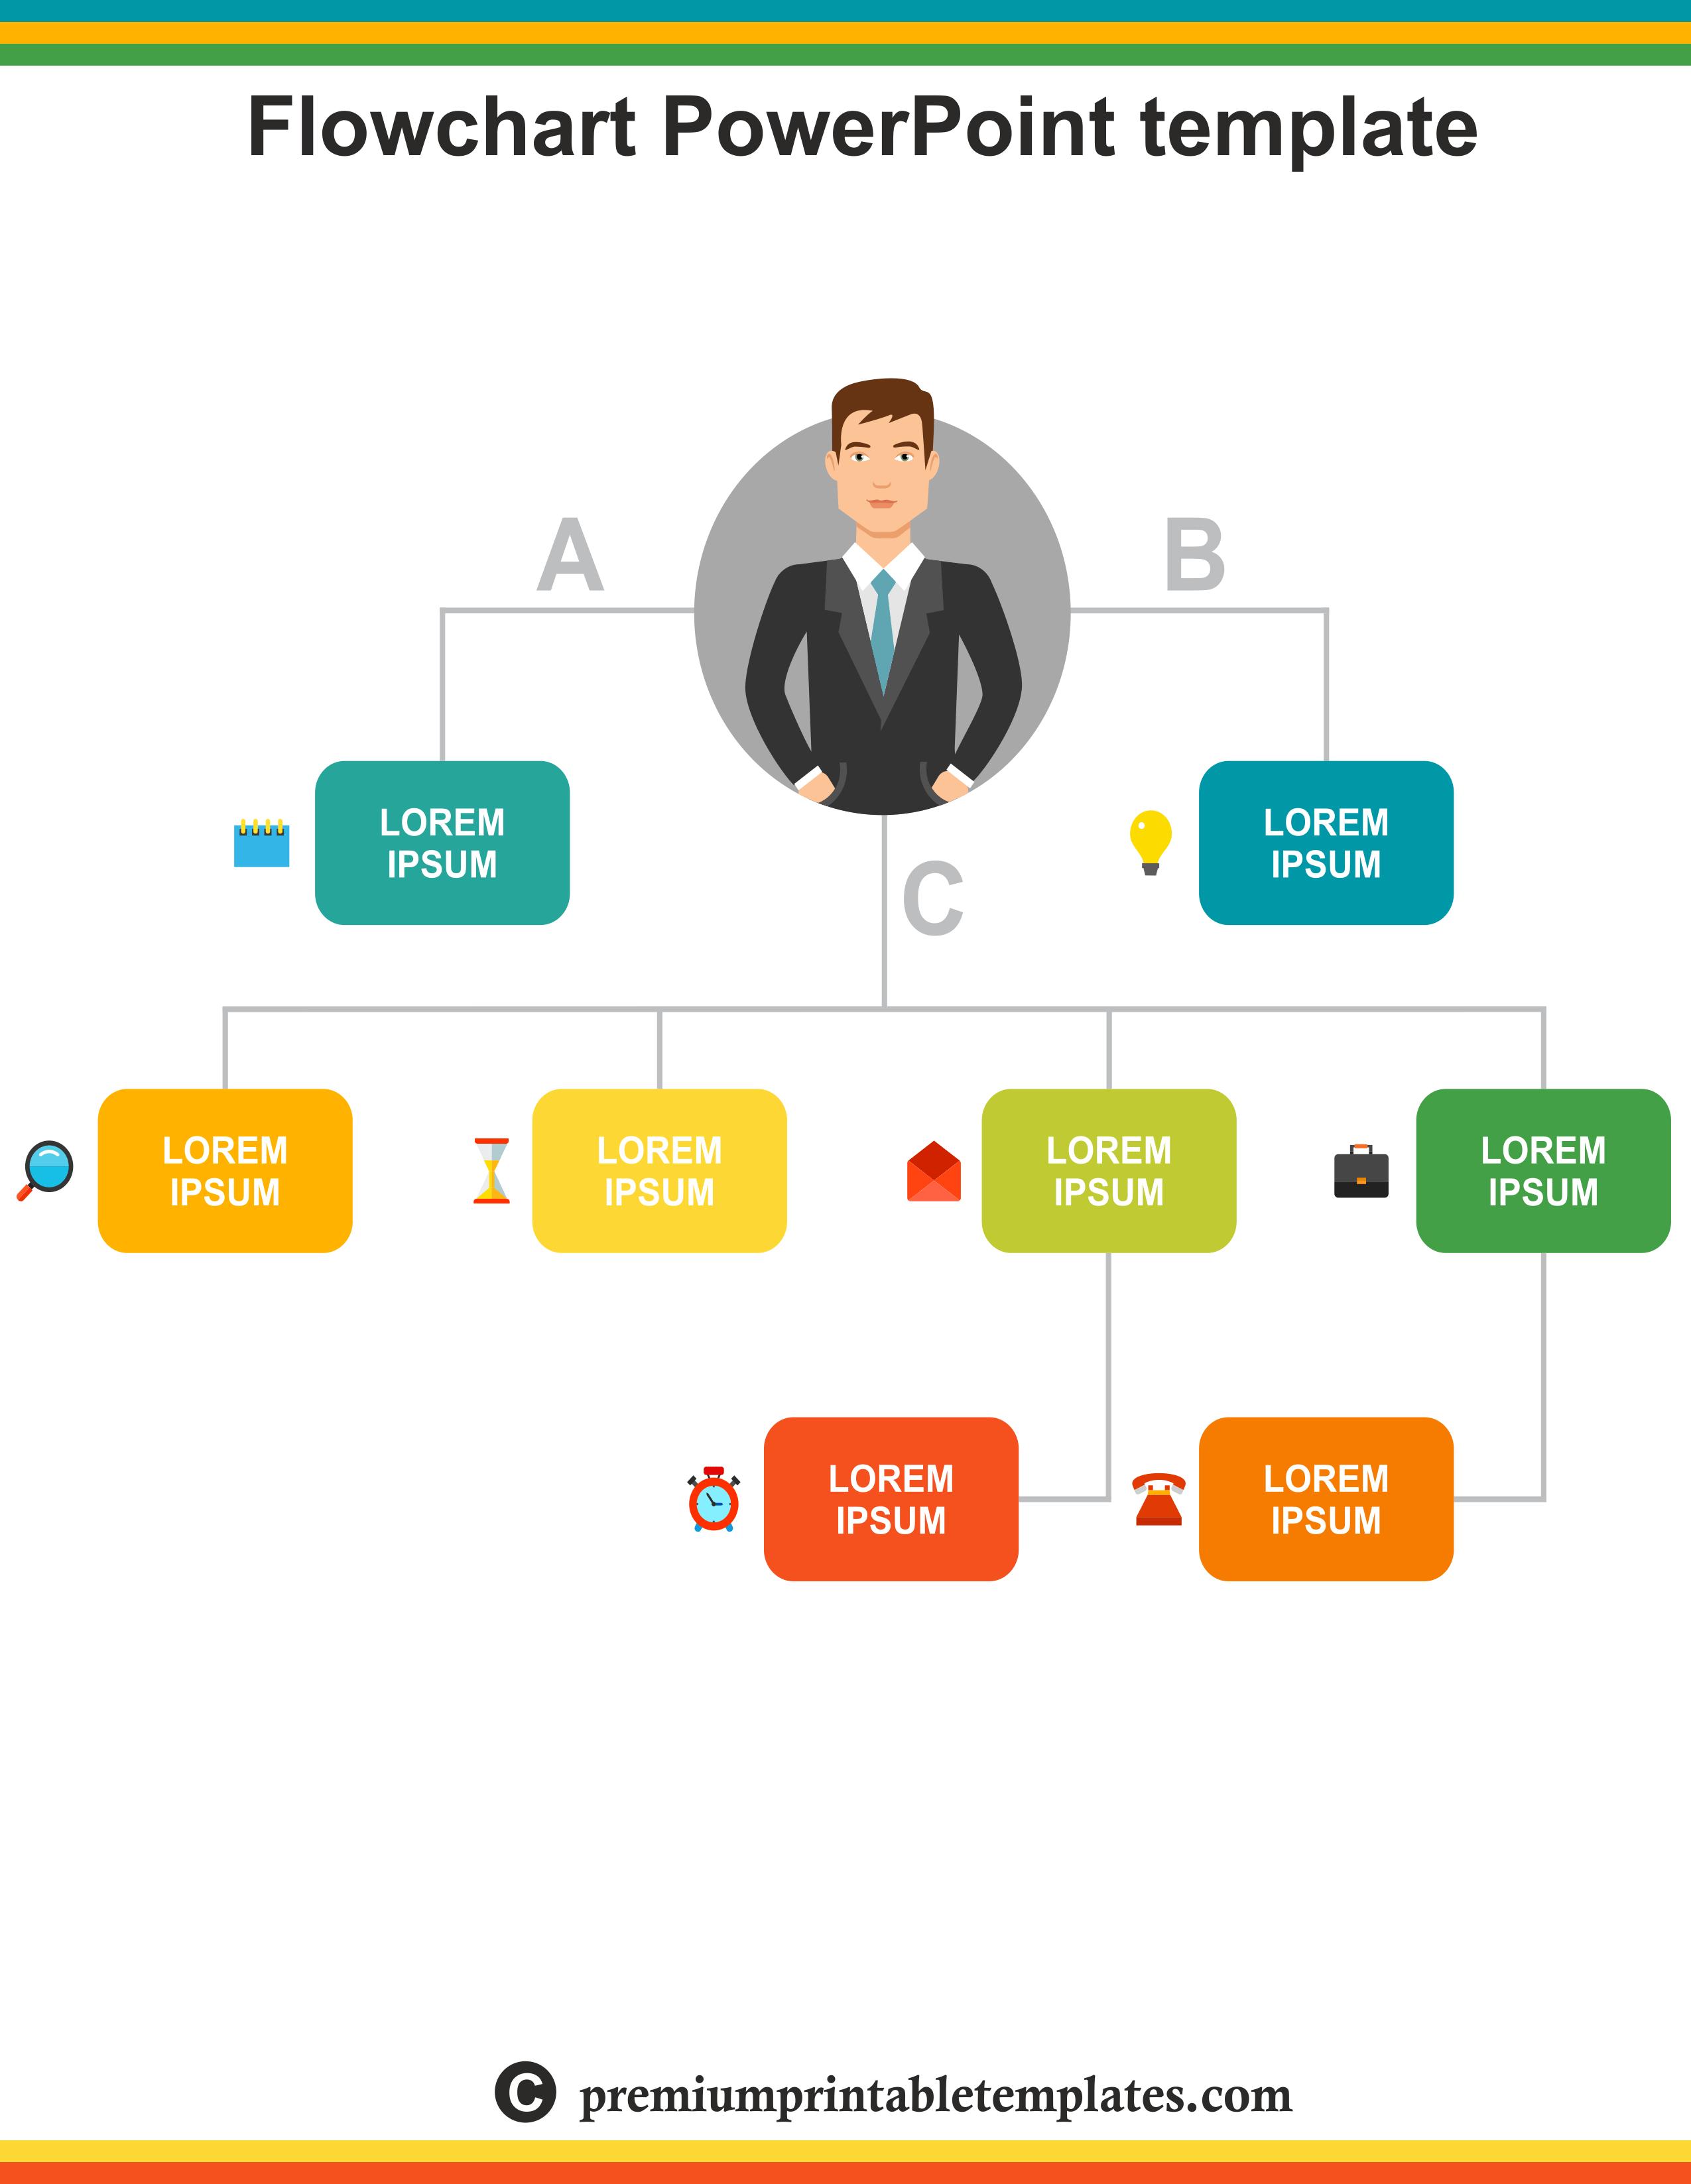 flow chart powerpoint templates – premium printable templates, Flowchart Powerpoint Template, Powerpoint templates